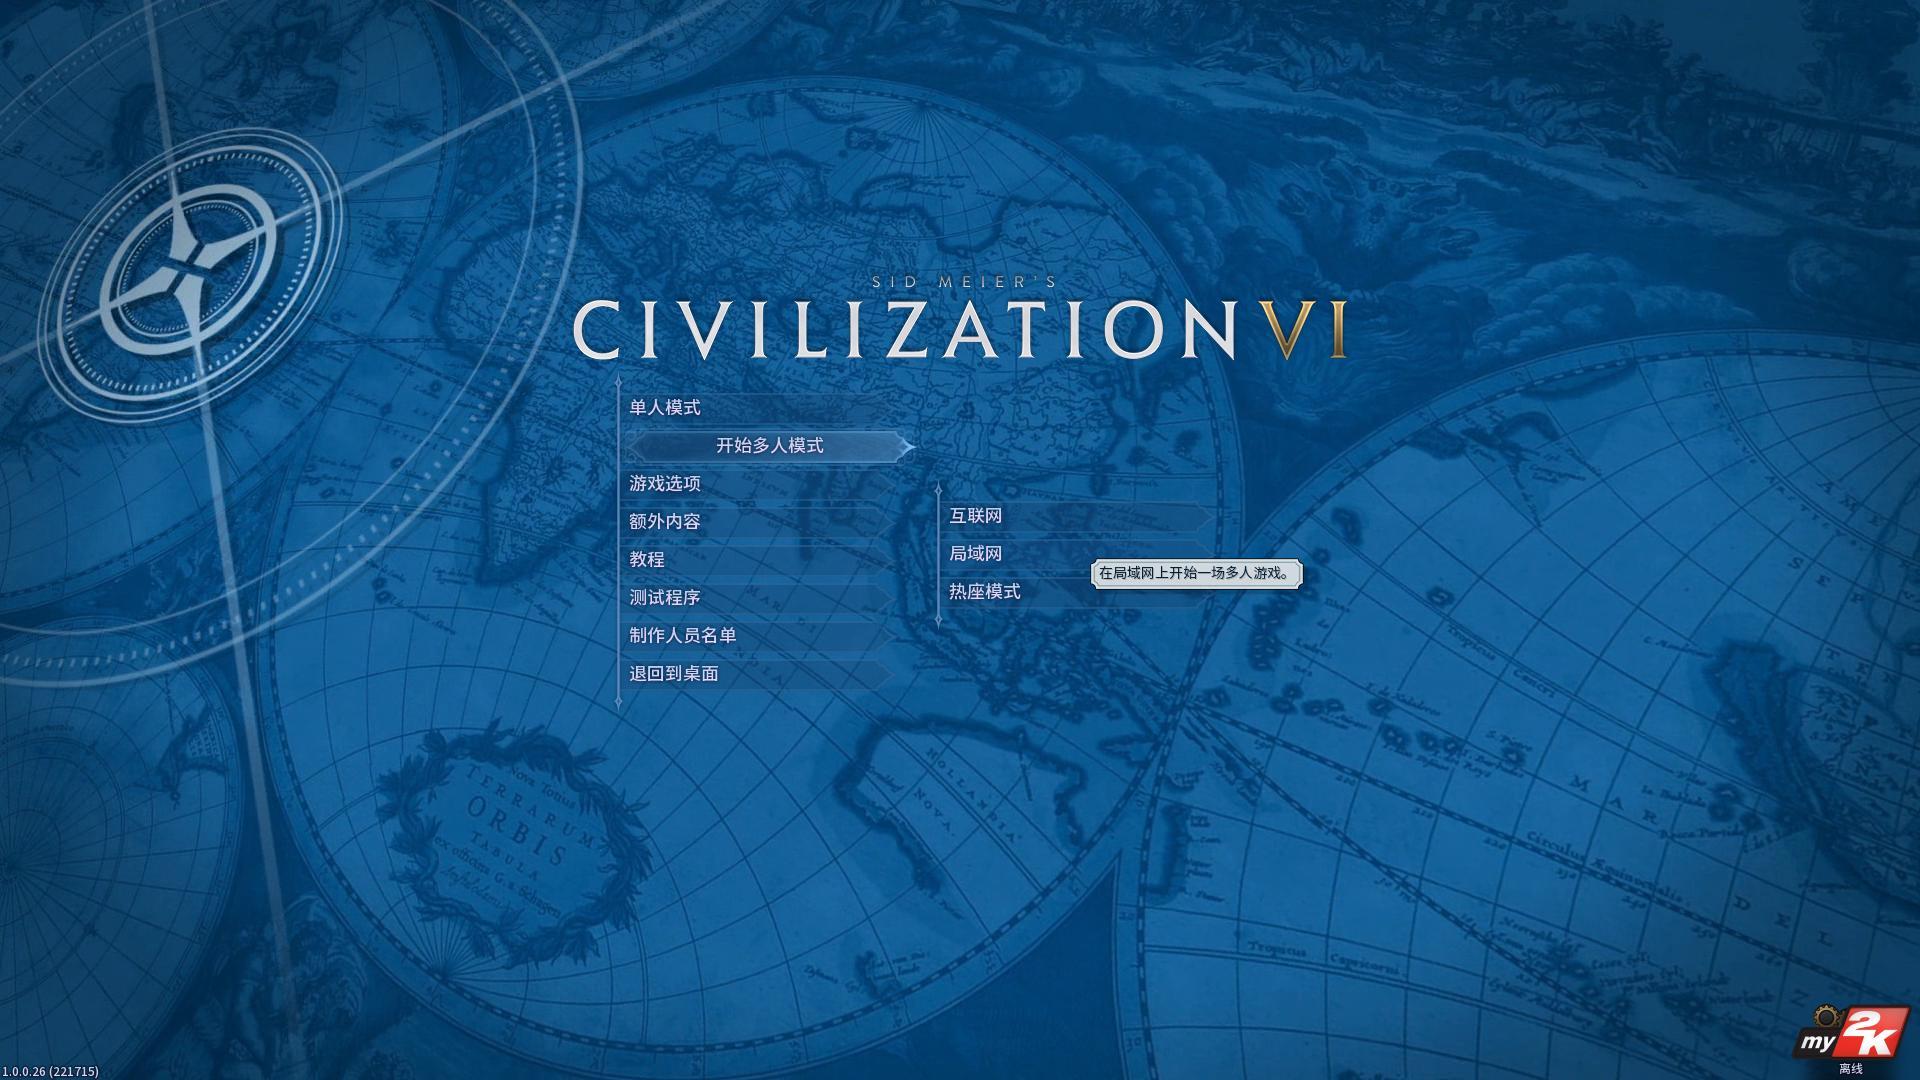 CivilizationVI 2016-10-21 15-09-38-06.jpg